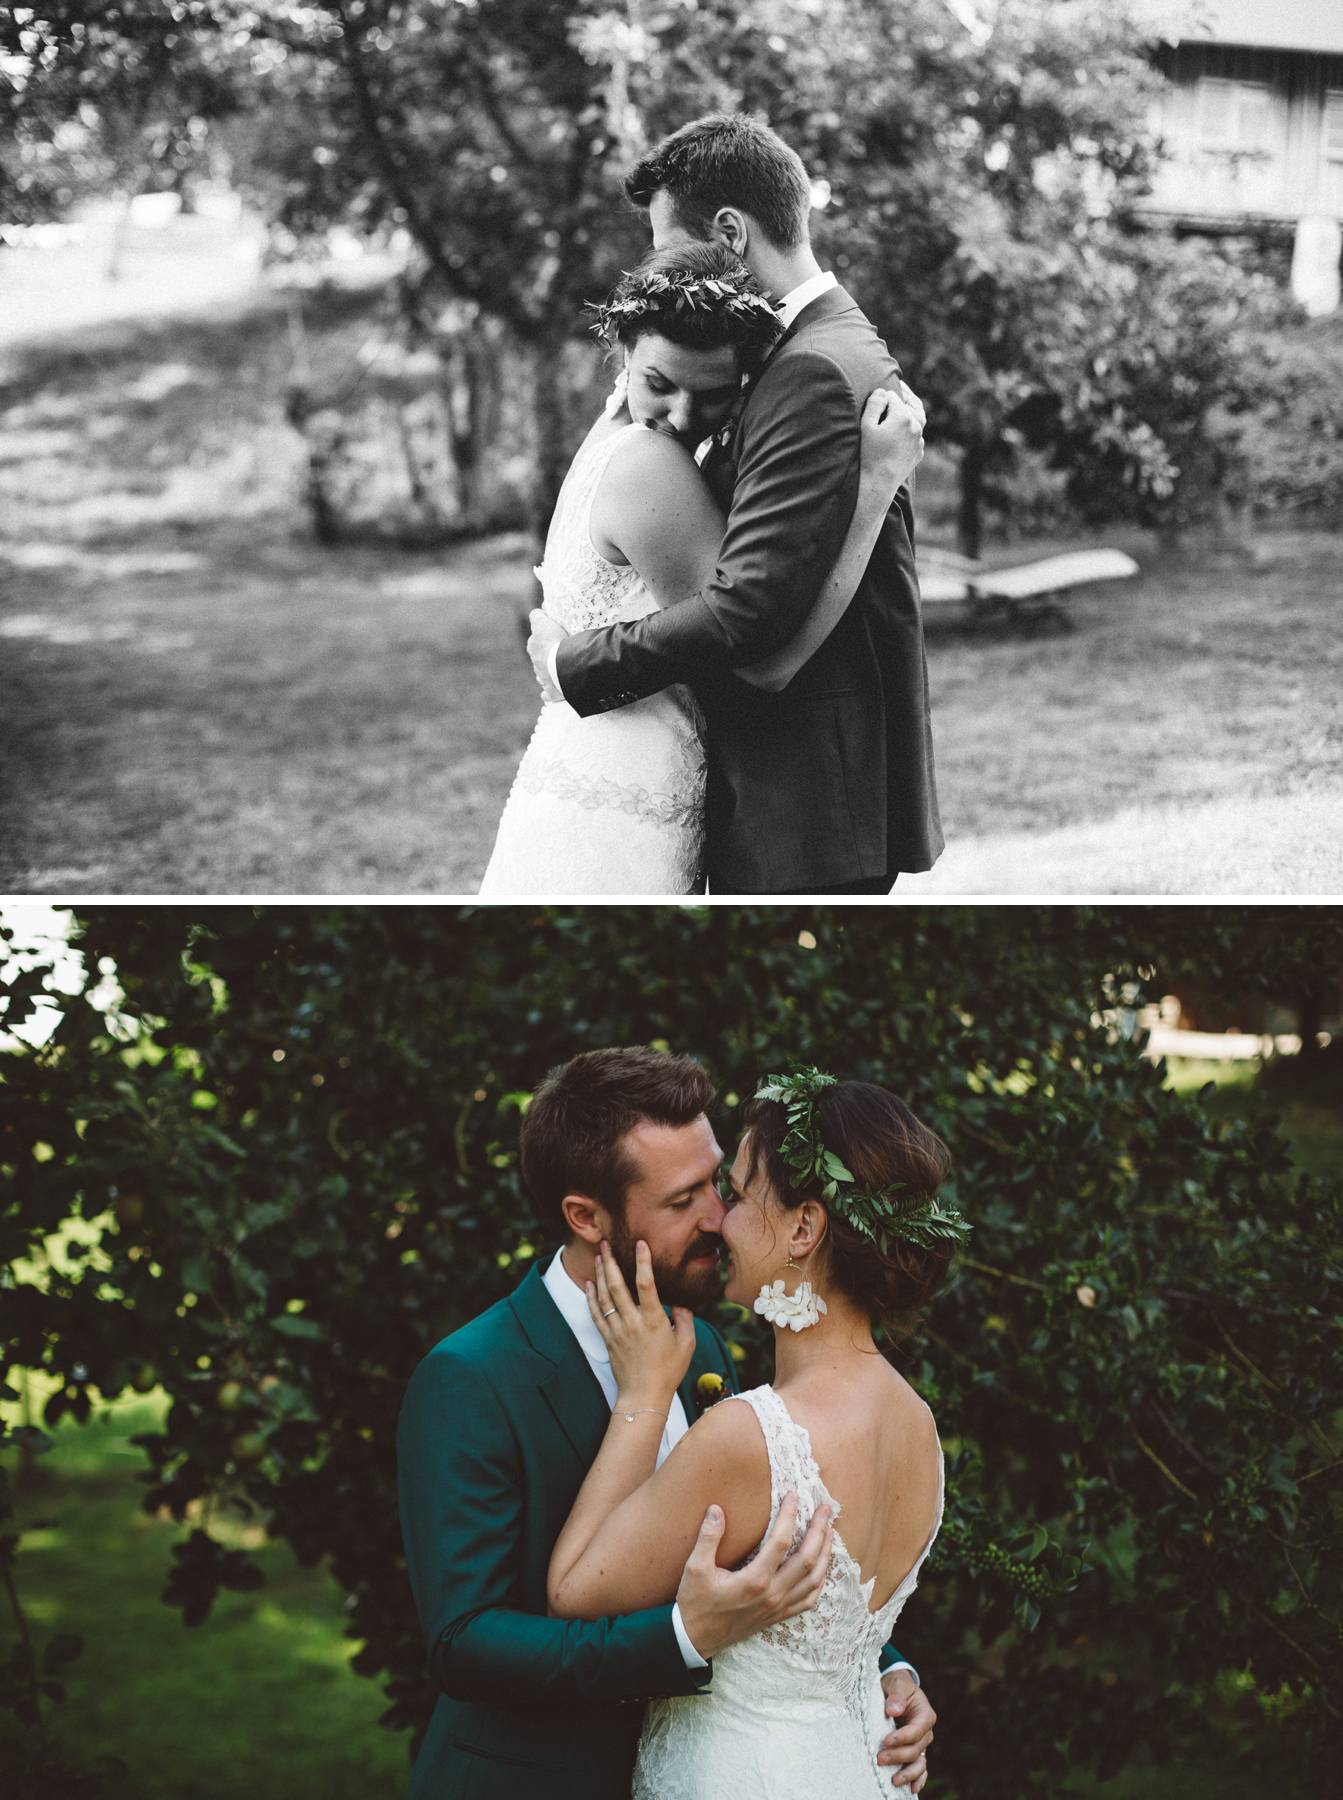 mariage-tropical-raben-horben_0025.jpg